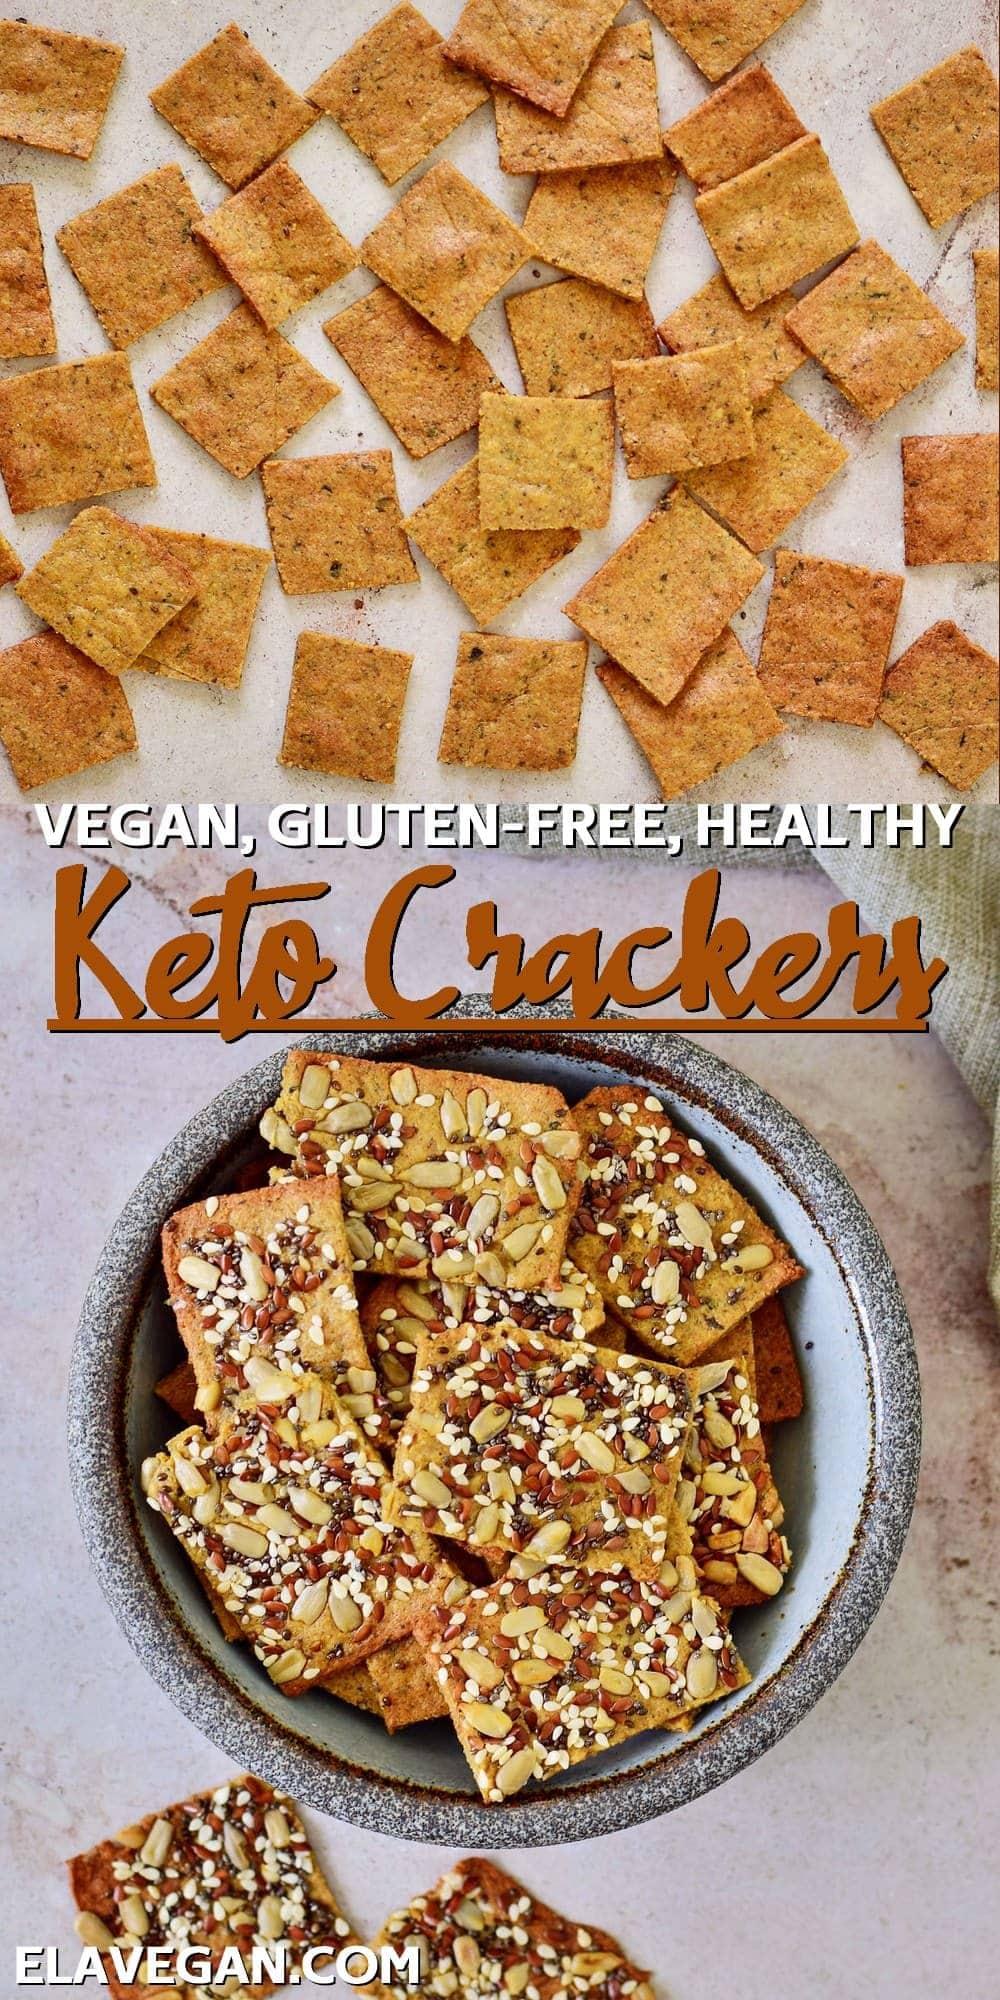 Collage vegan, gluten-free, healthy, keto crackers